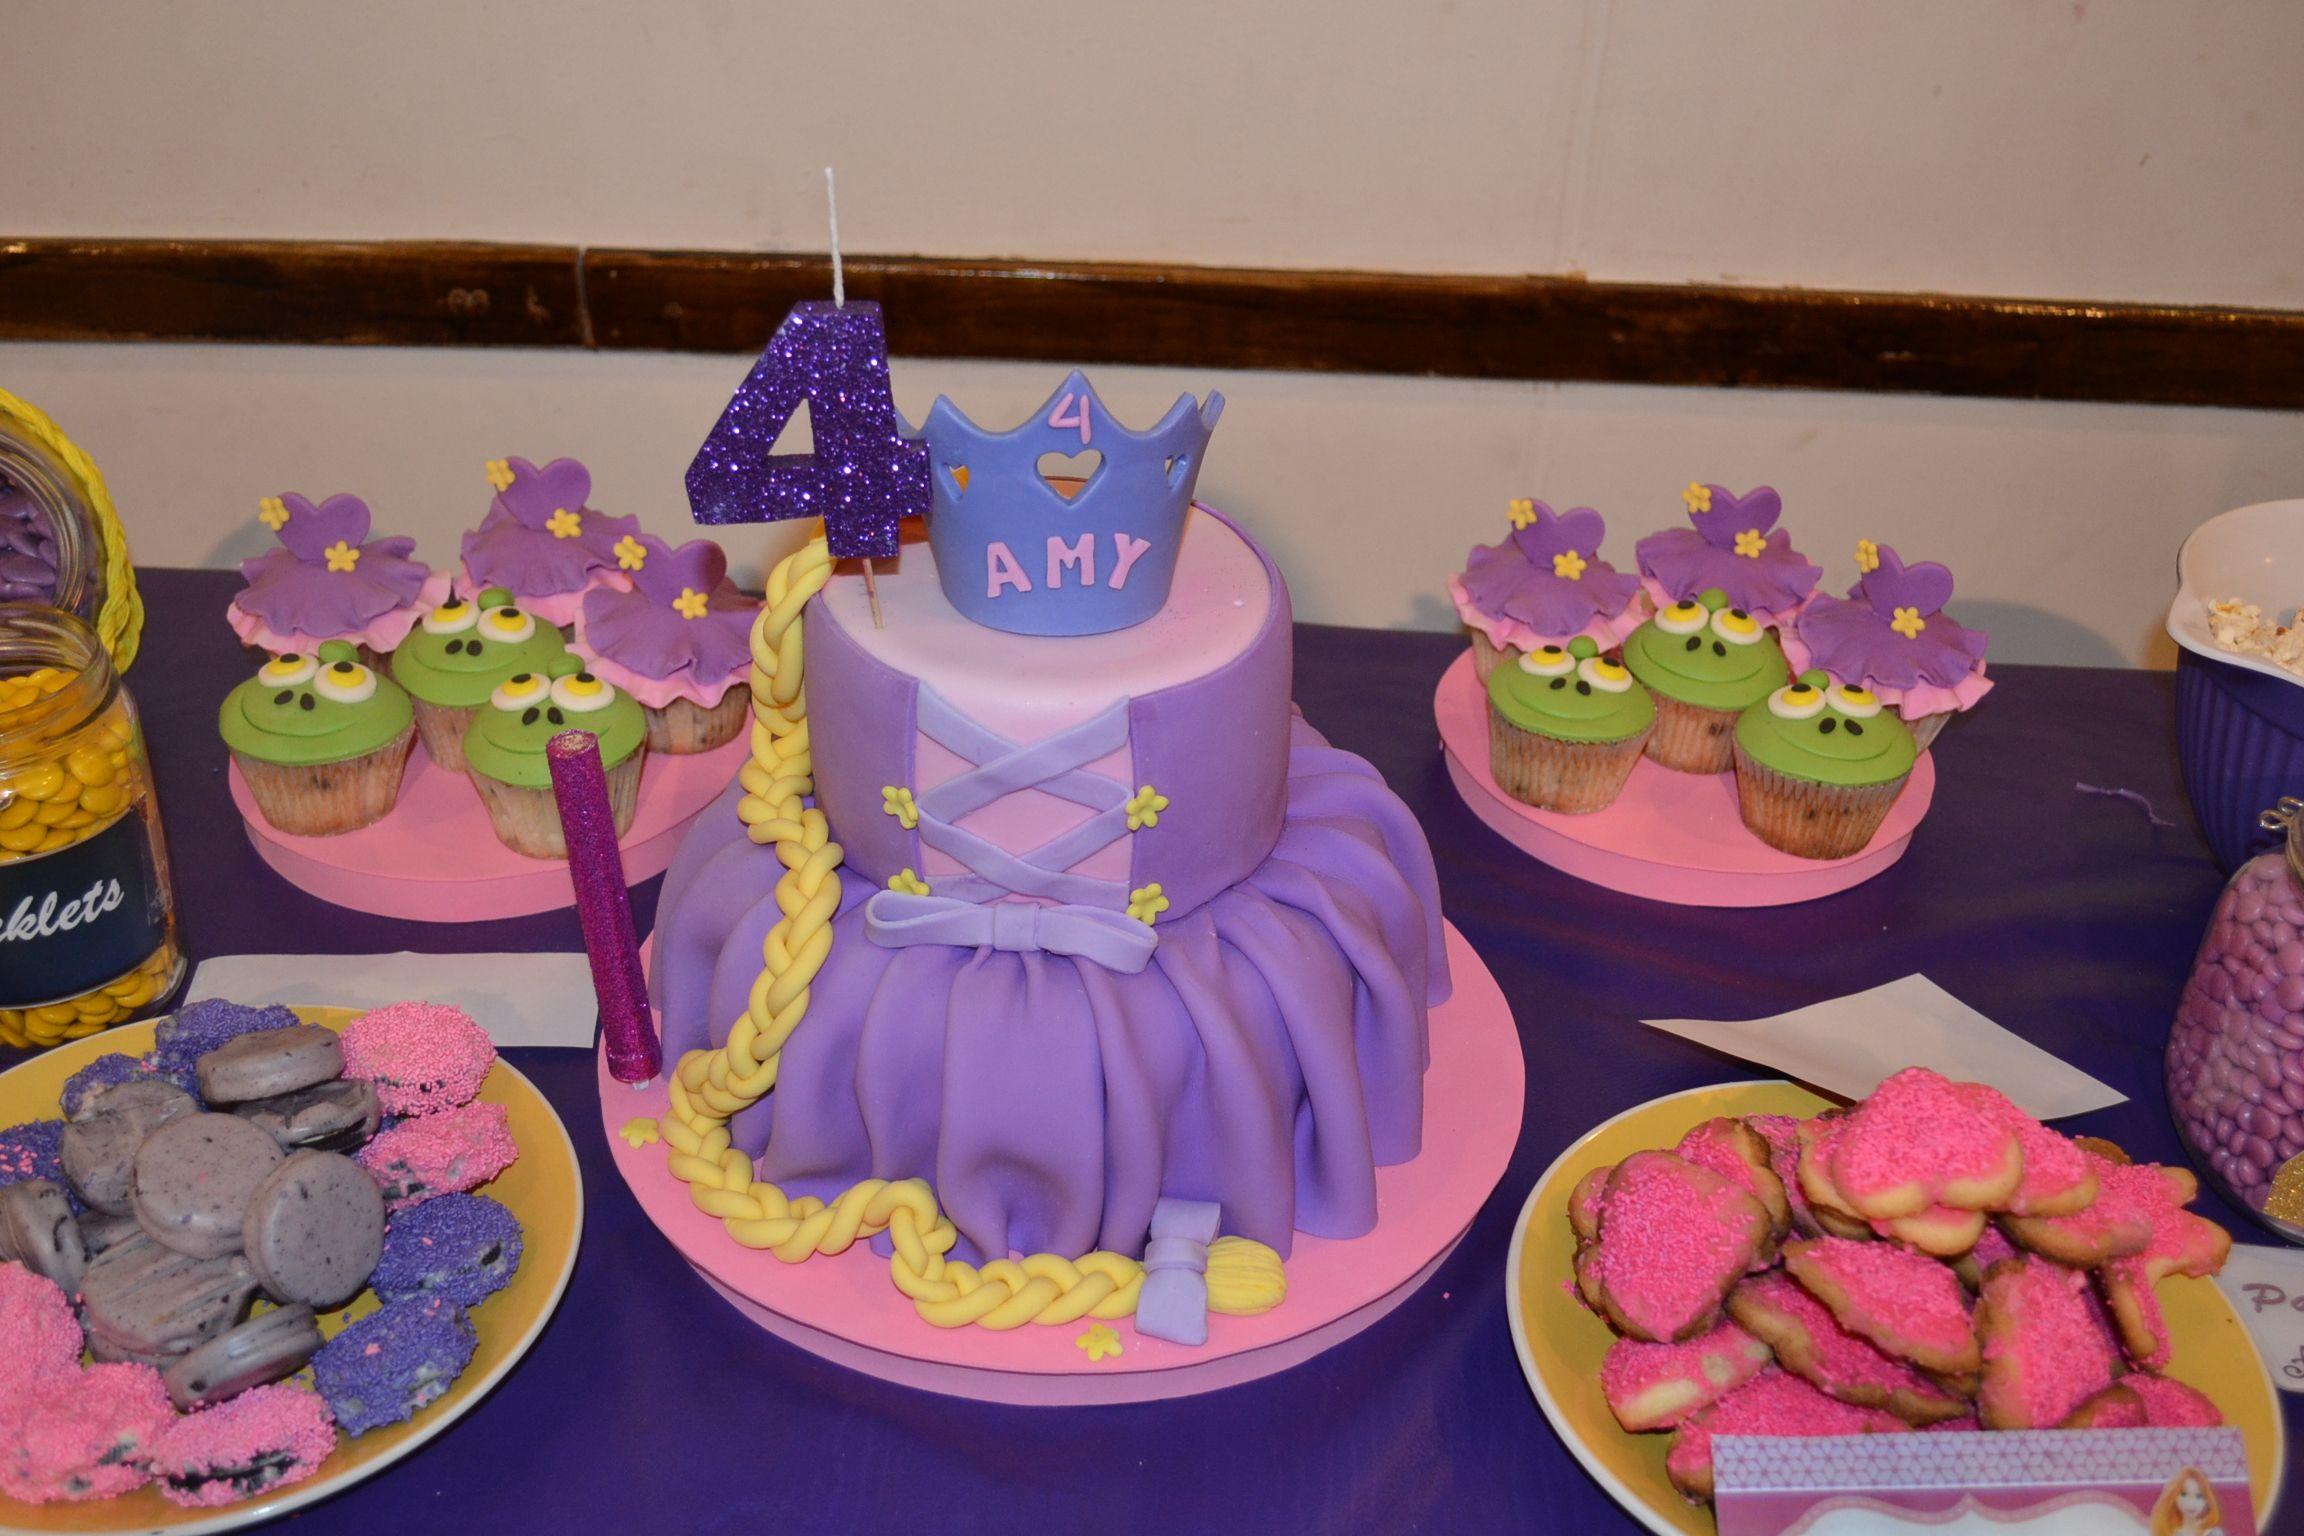 Torta Rapunzel #princessparty #baking #bake #cake #dresscake #tangledparty #rapunzelcake #rapunzel #crown #cookies #oreo #pascalcupcakes #dresscupcakes